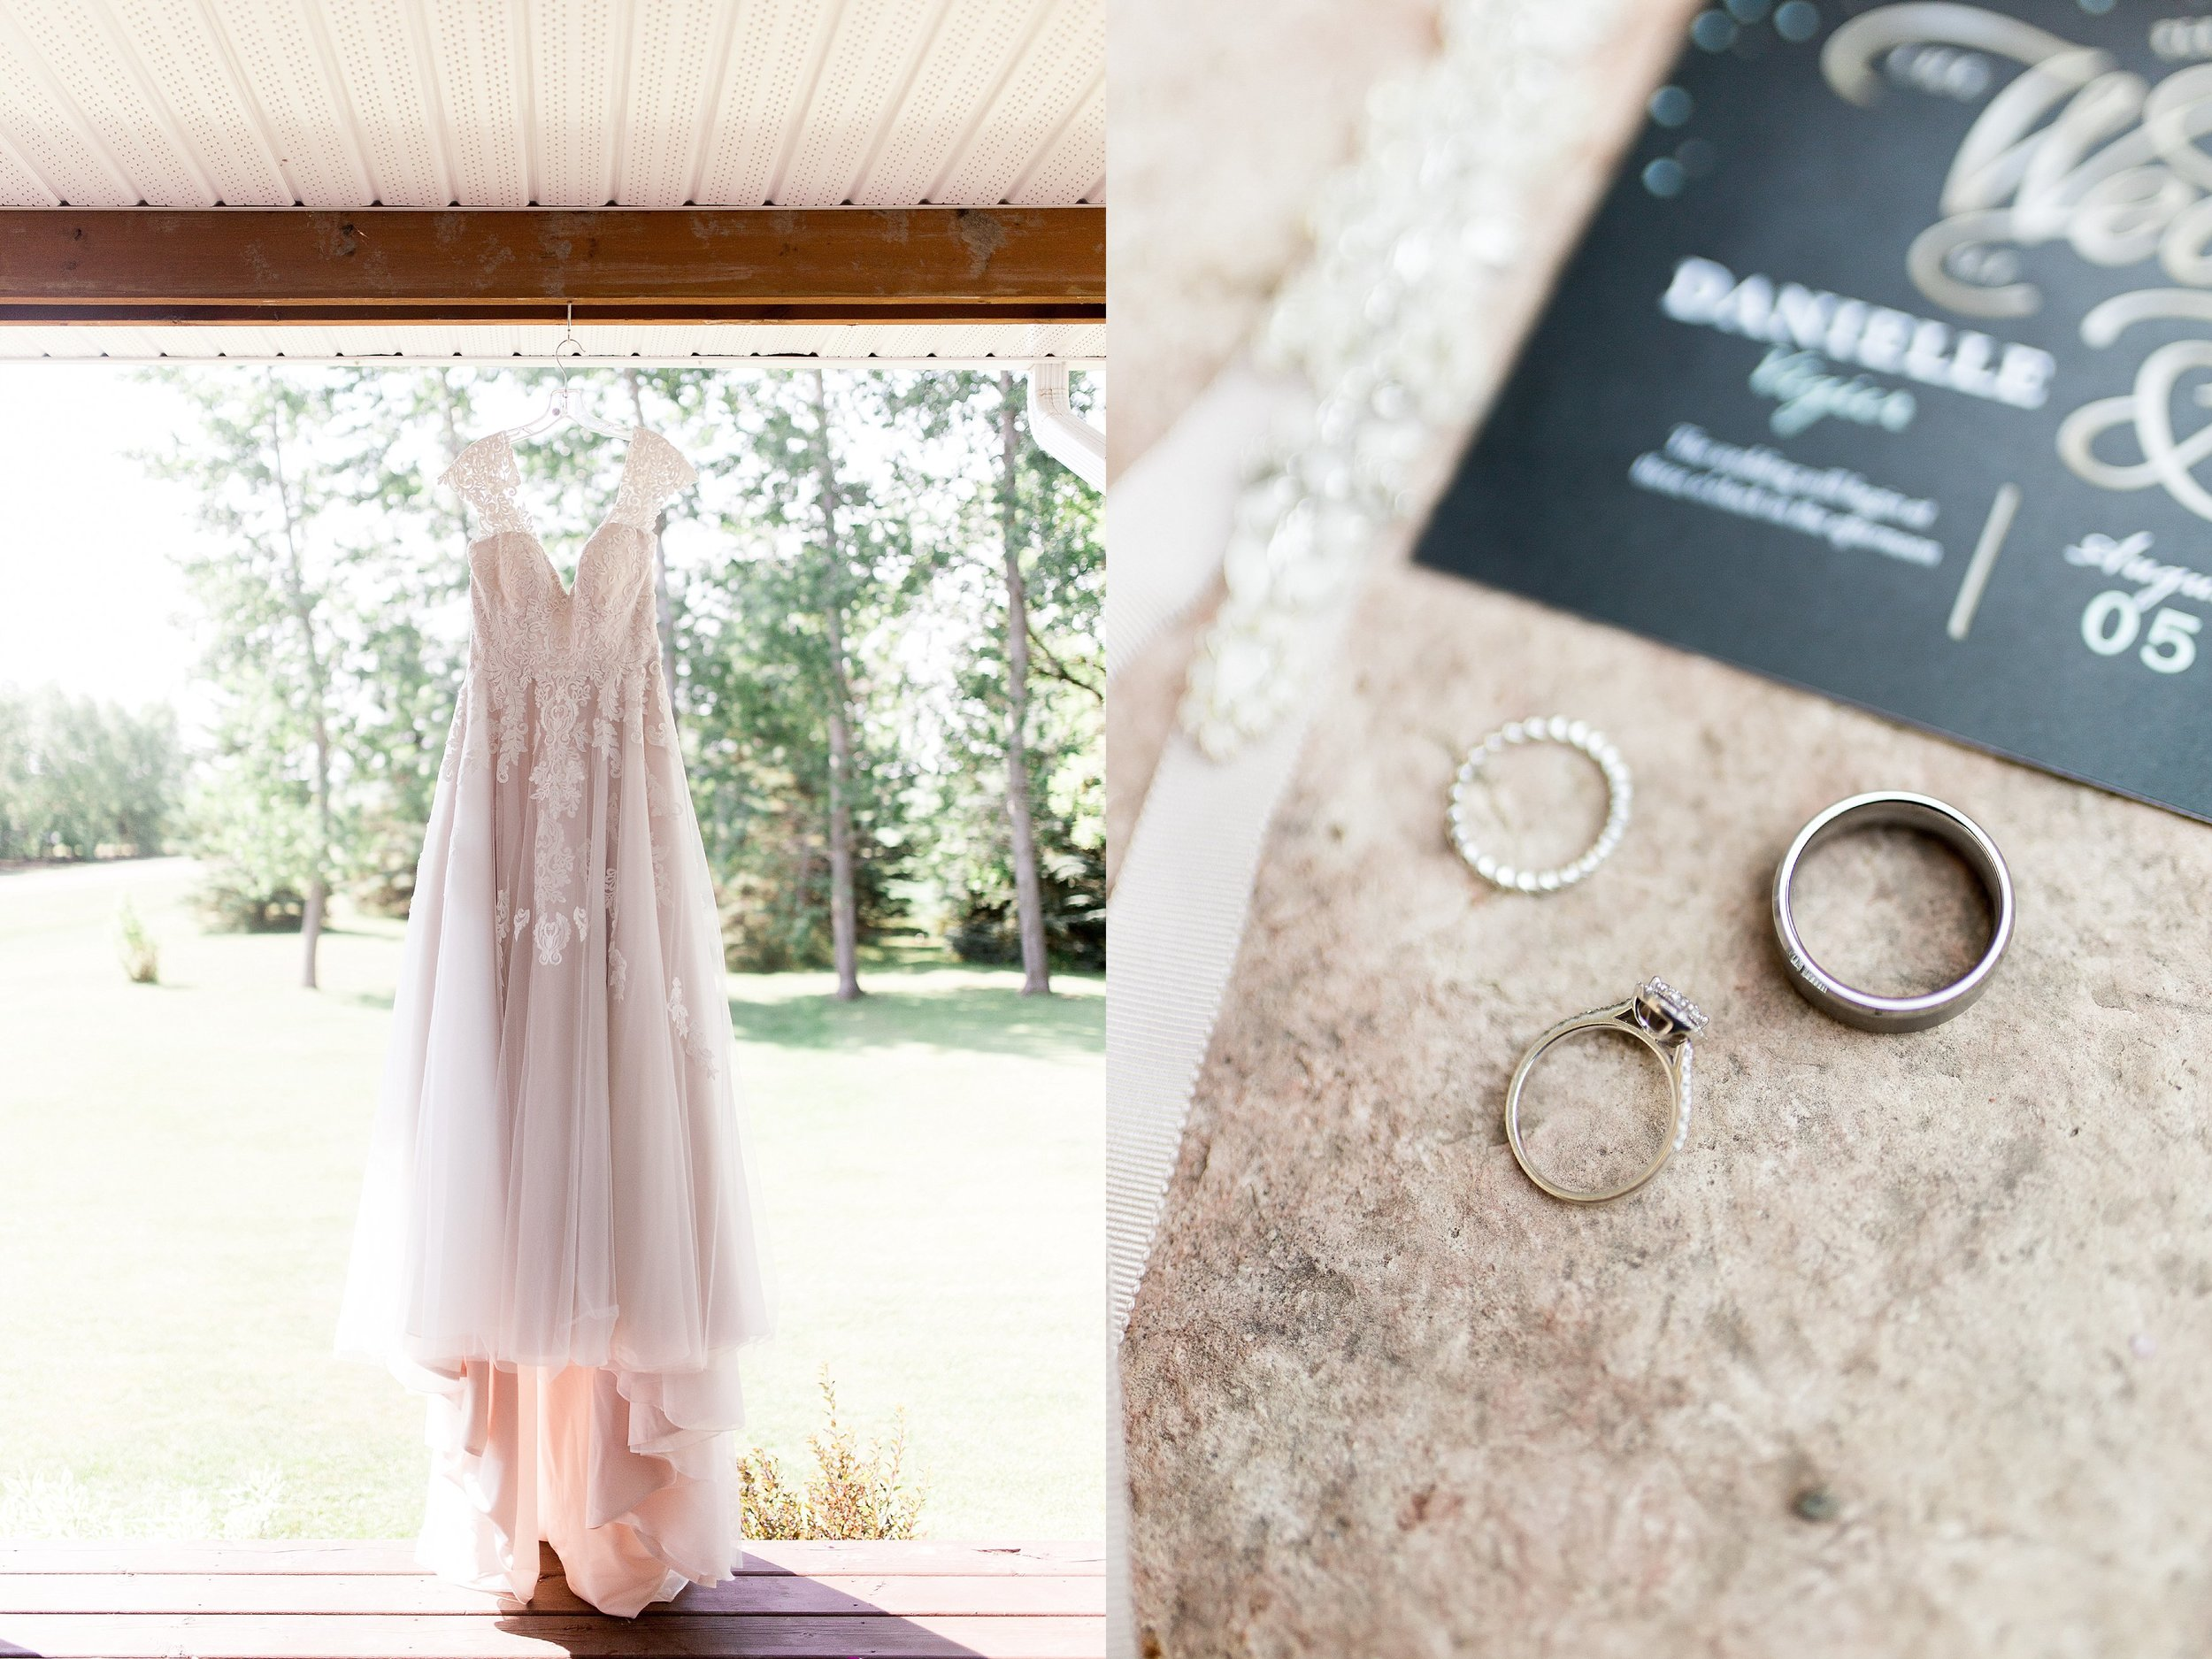 Blush Wedding Dress, Stella's Bridal Wedding Dress, Manitoba Wedding Photographer, Prairie Wedding, Wedding Ring photos, Wedding details, Keila Marie Photography